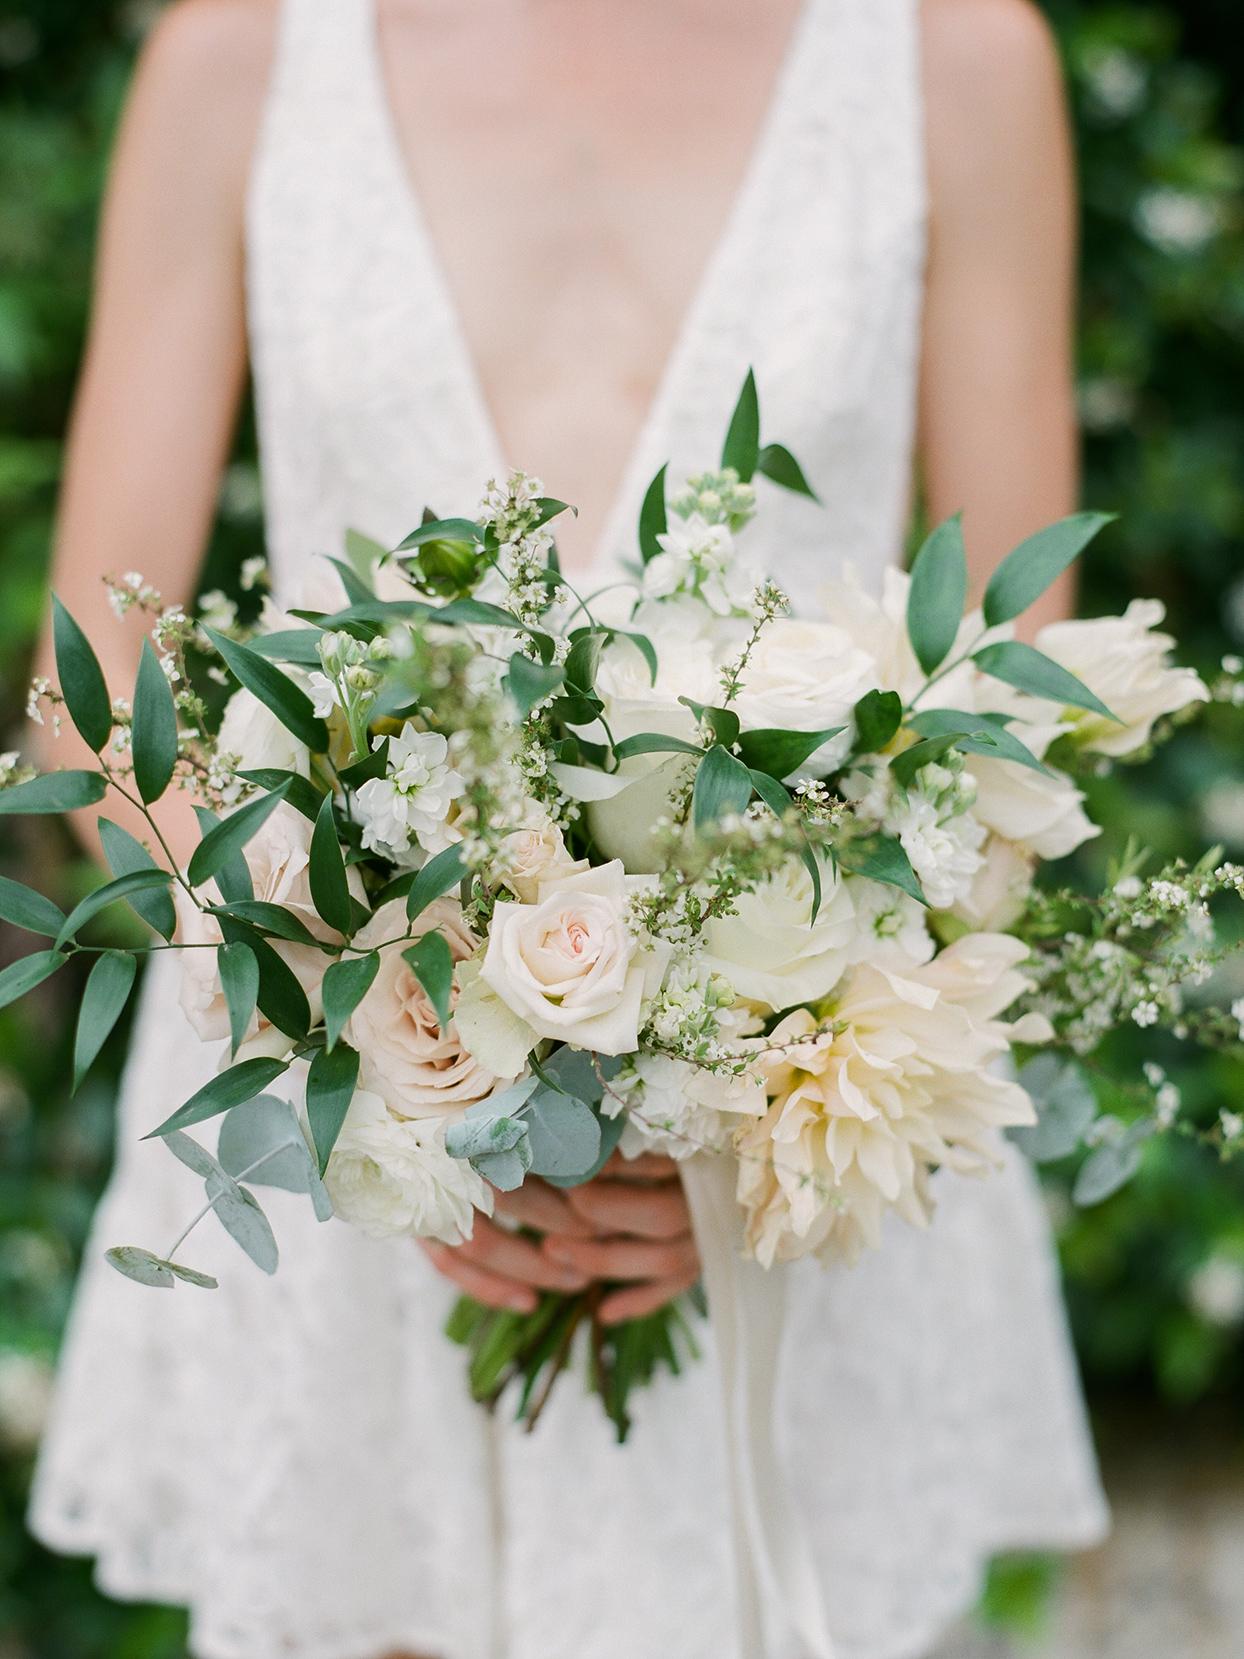 Bride with bouquet of white O'Hara garden roses, cafe au lait dahlias, ranunculus, mixed eucalyptus, and jasmine